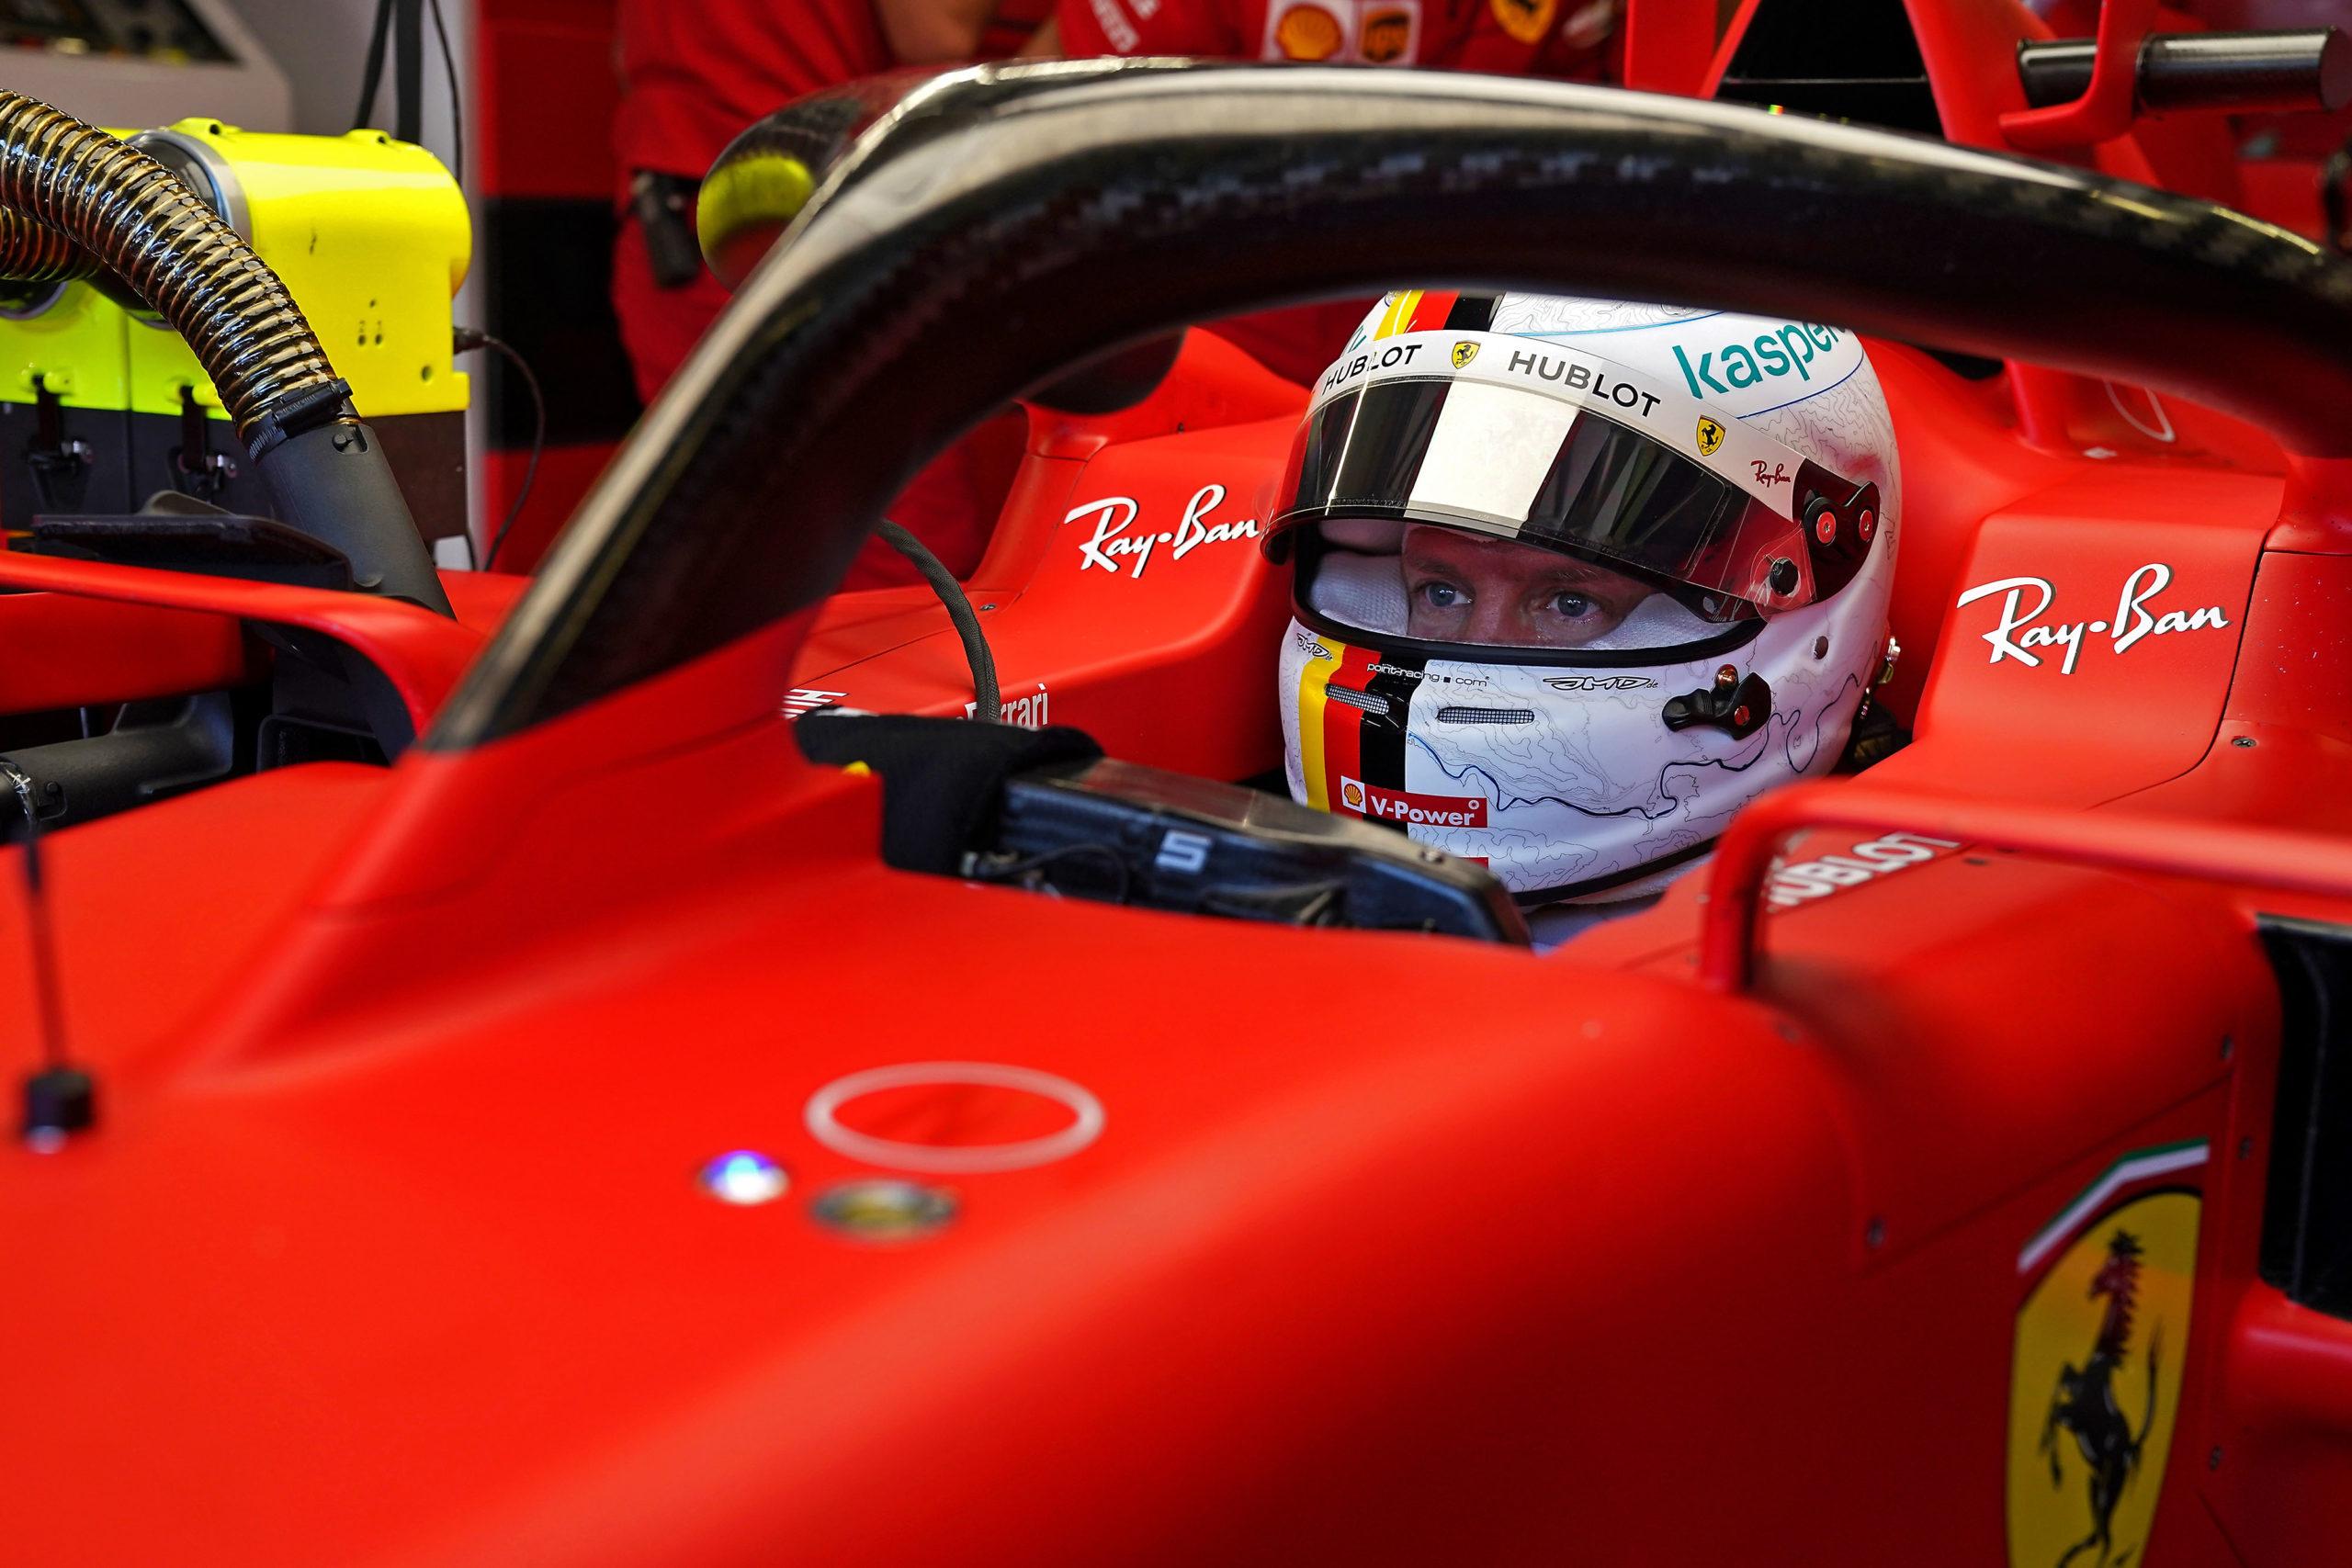 GP STYRIA F1/2020 -  VENERDÌ 10/07/2020        credit: @Scuderia Ferrari Press Office, Vettel